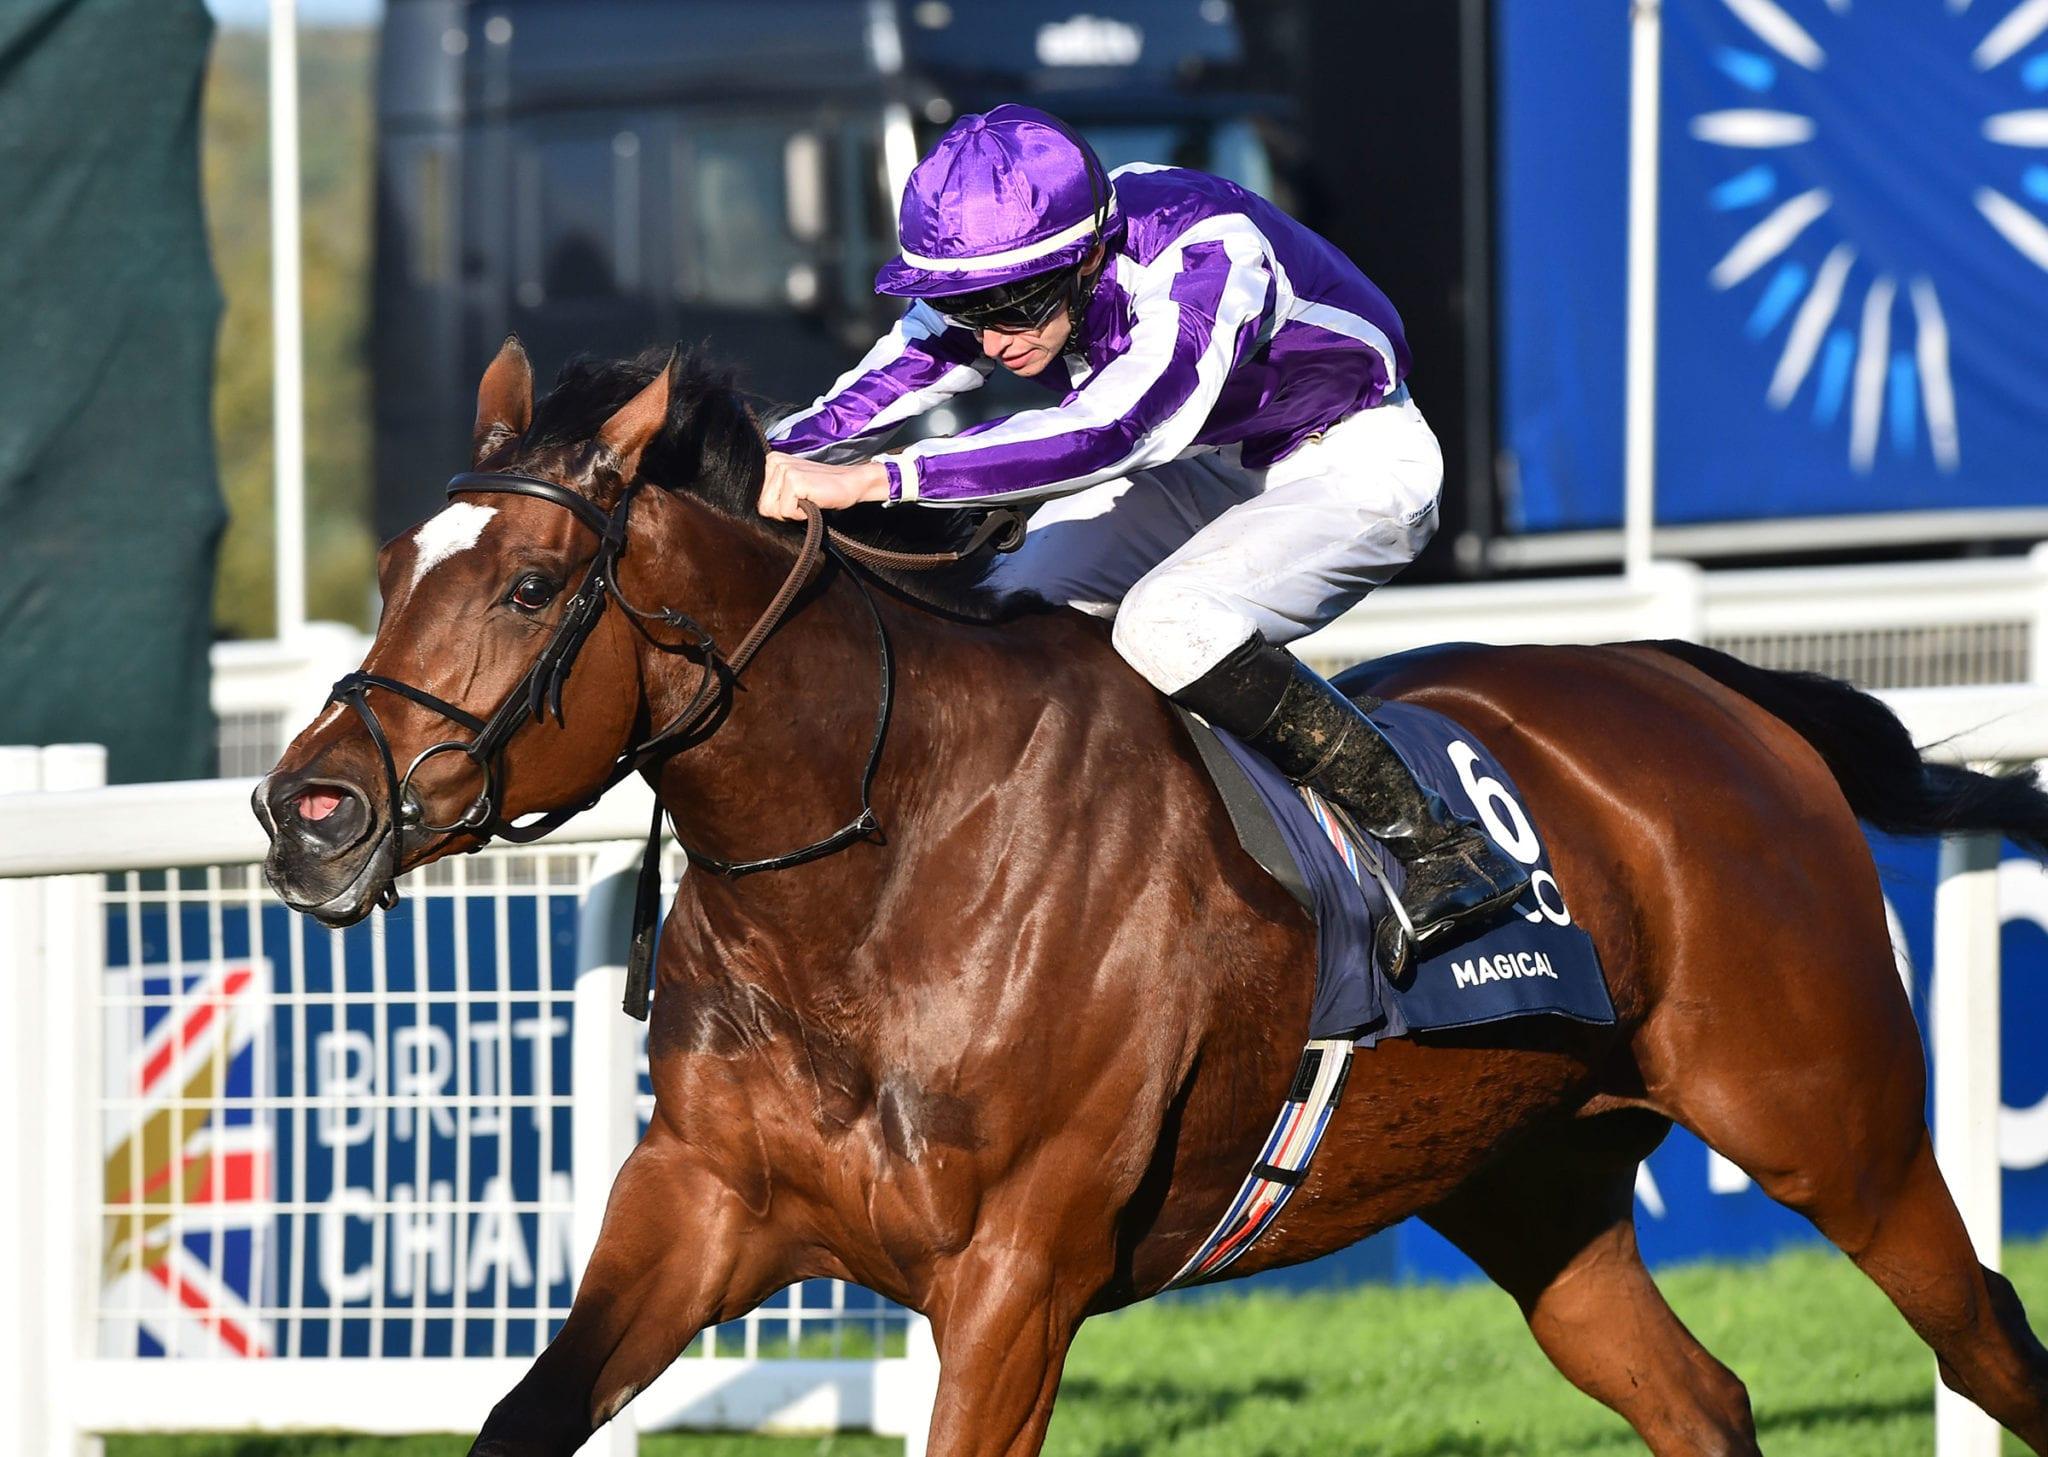 horse racing betting online uk pharmacy